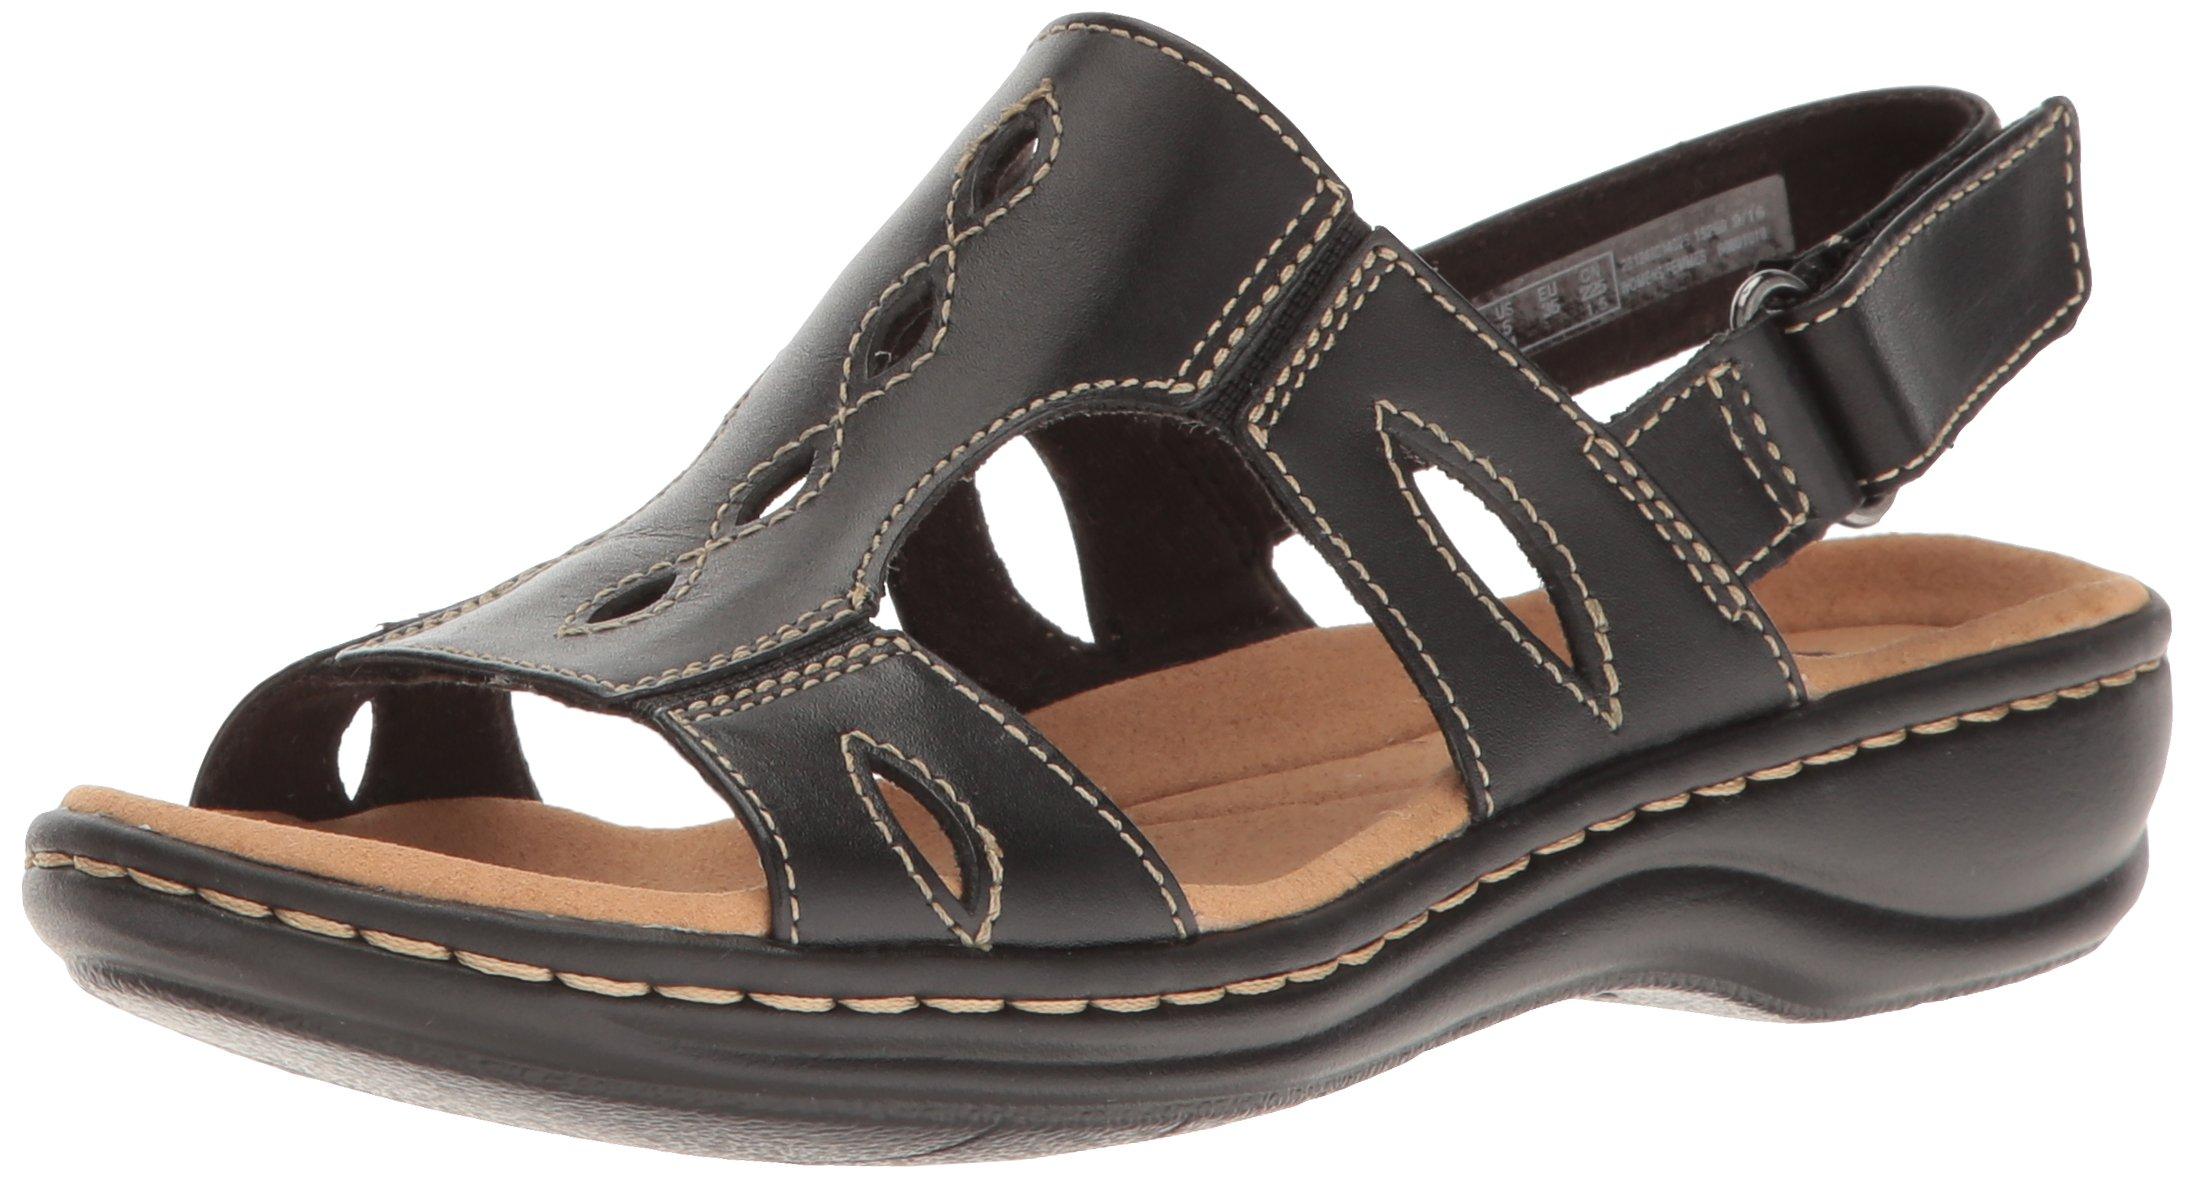 CLARKS Women's Leisa Lakelyn Flat Sandal, Black Leather, 8 M US by CLARKS